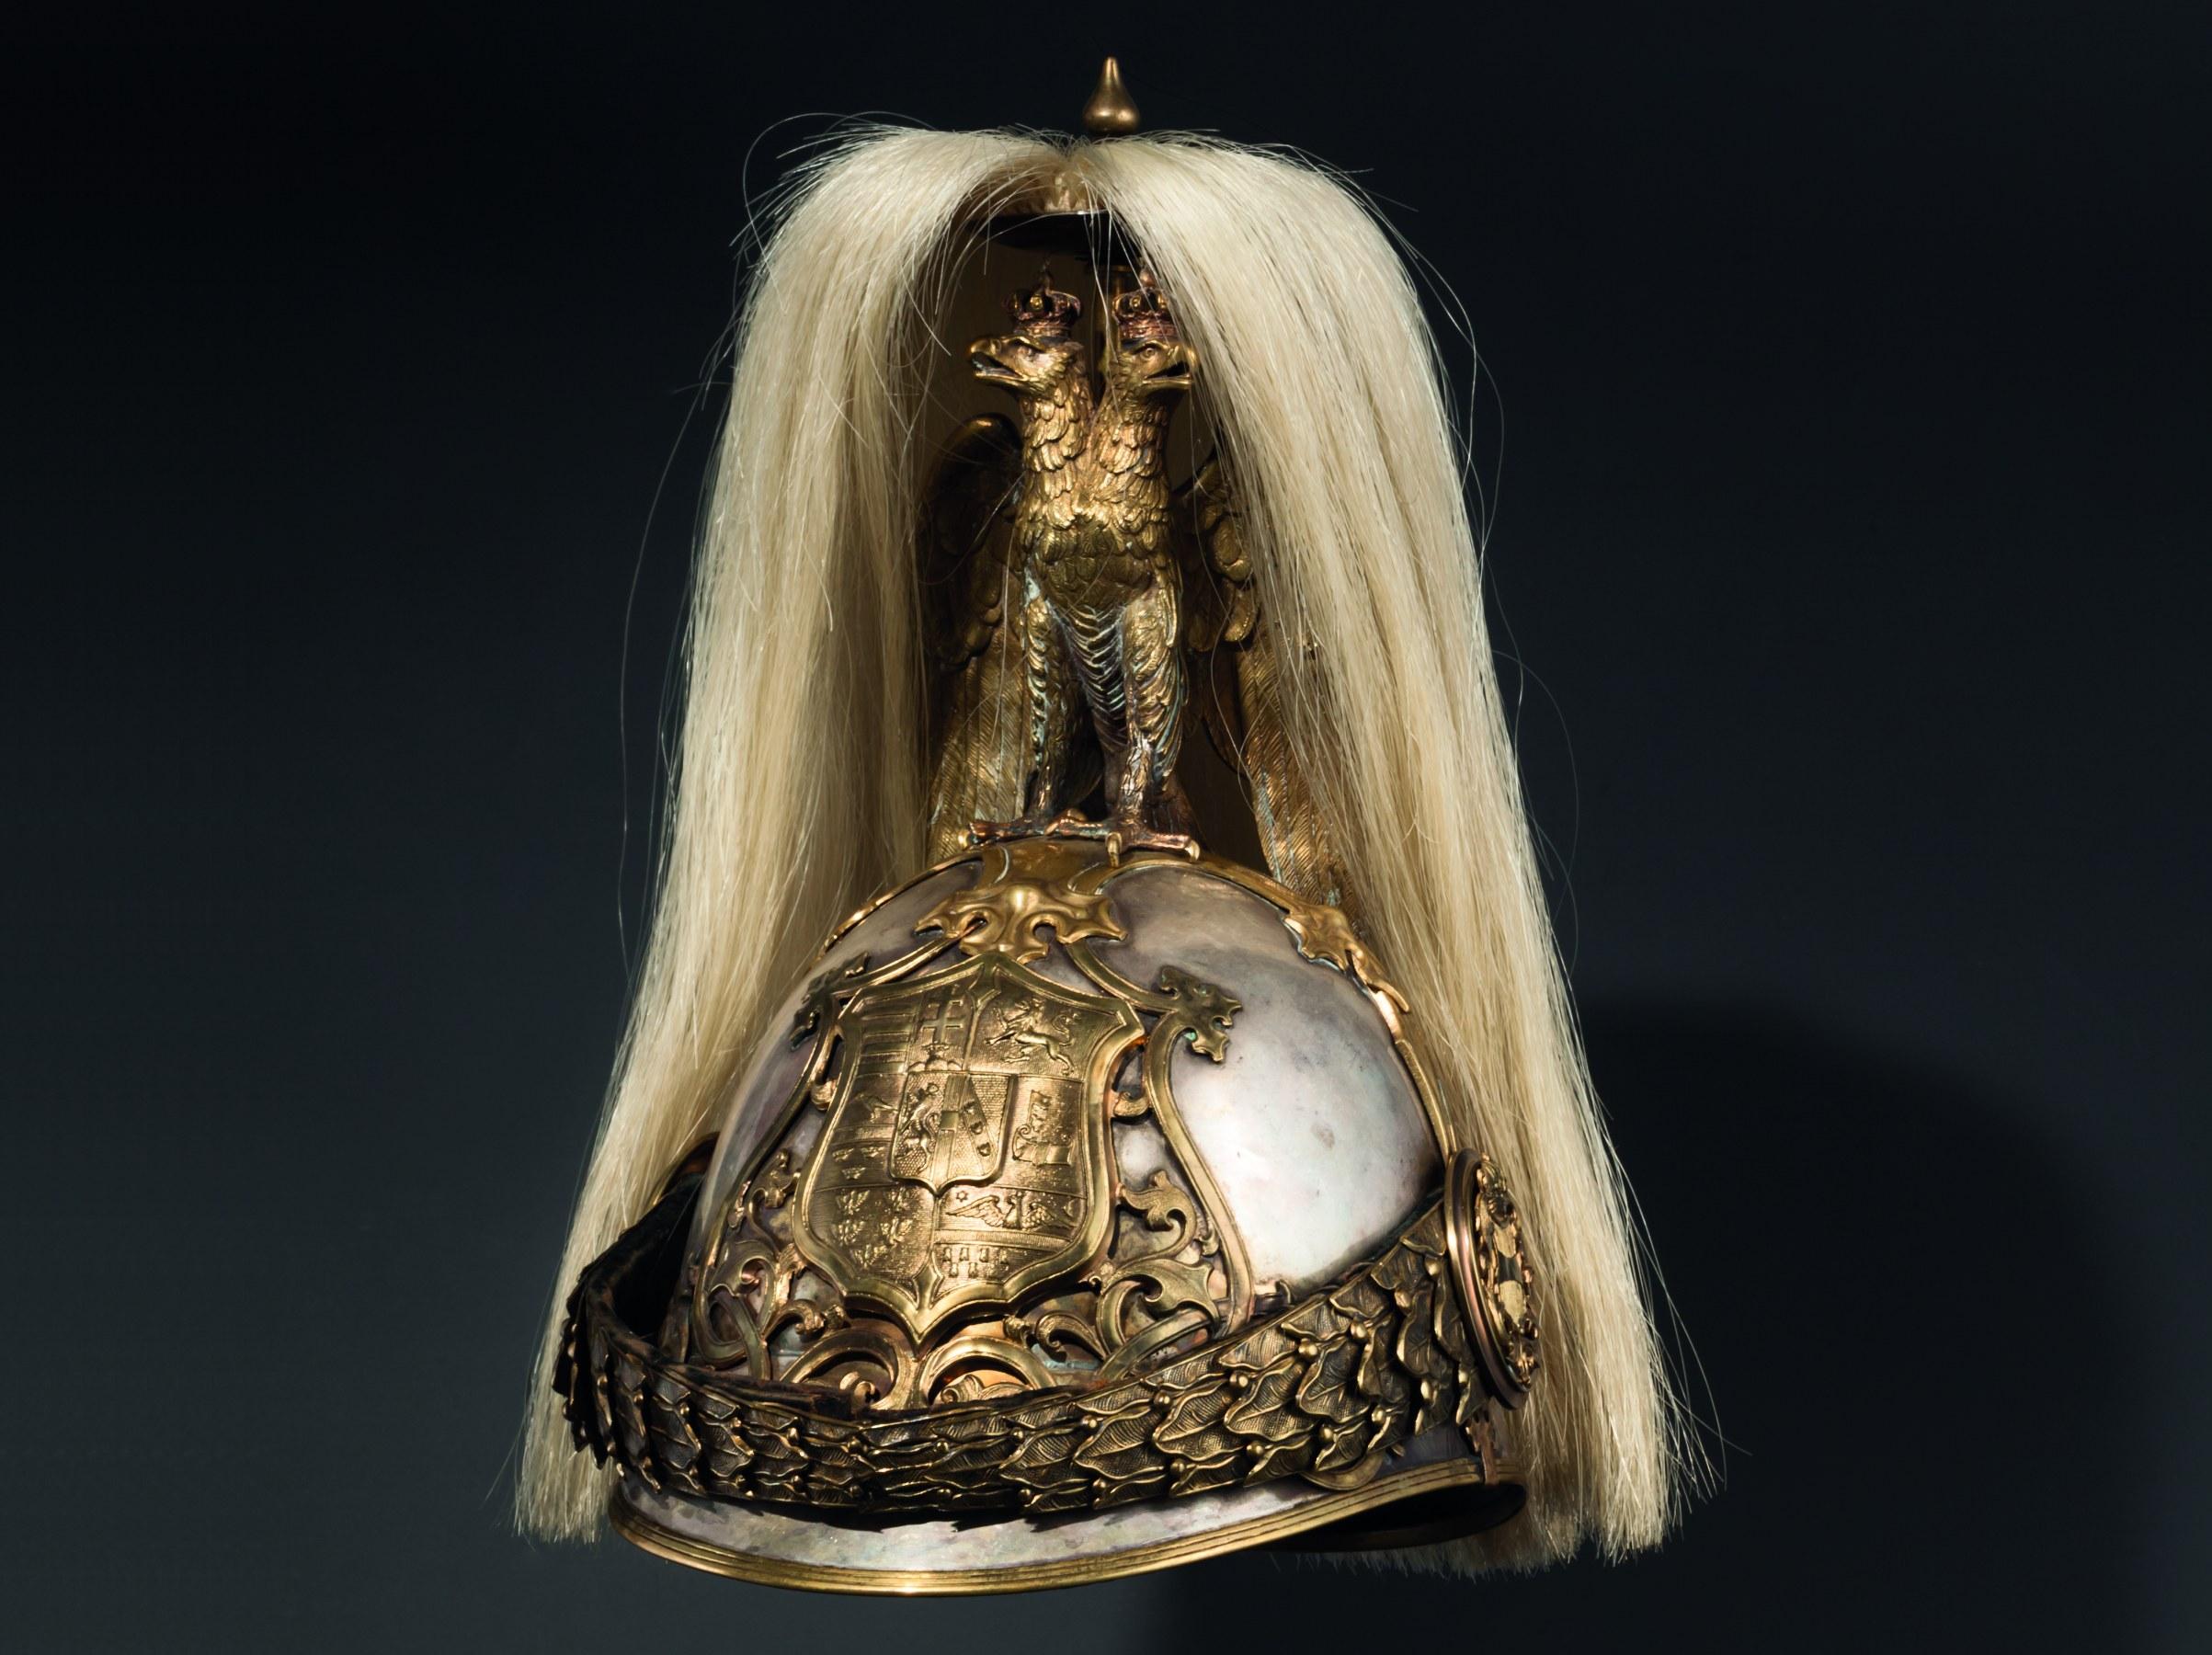 Helm der k. u. k. Ersten Arcierenleibgarde, 1905